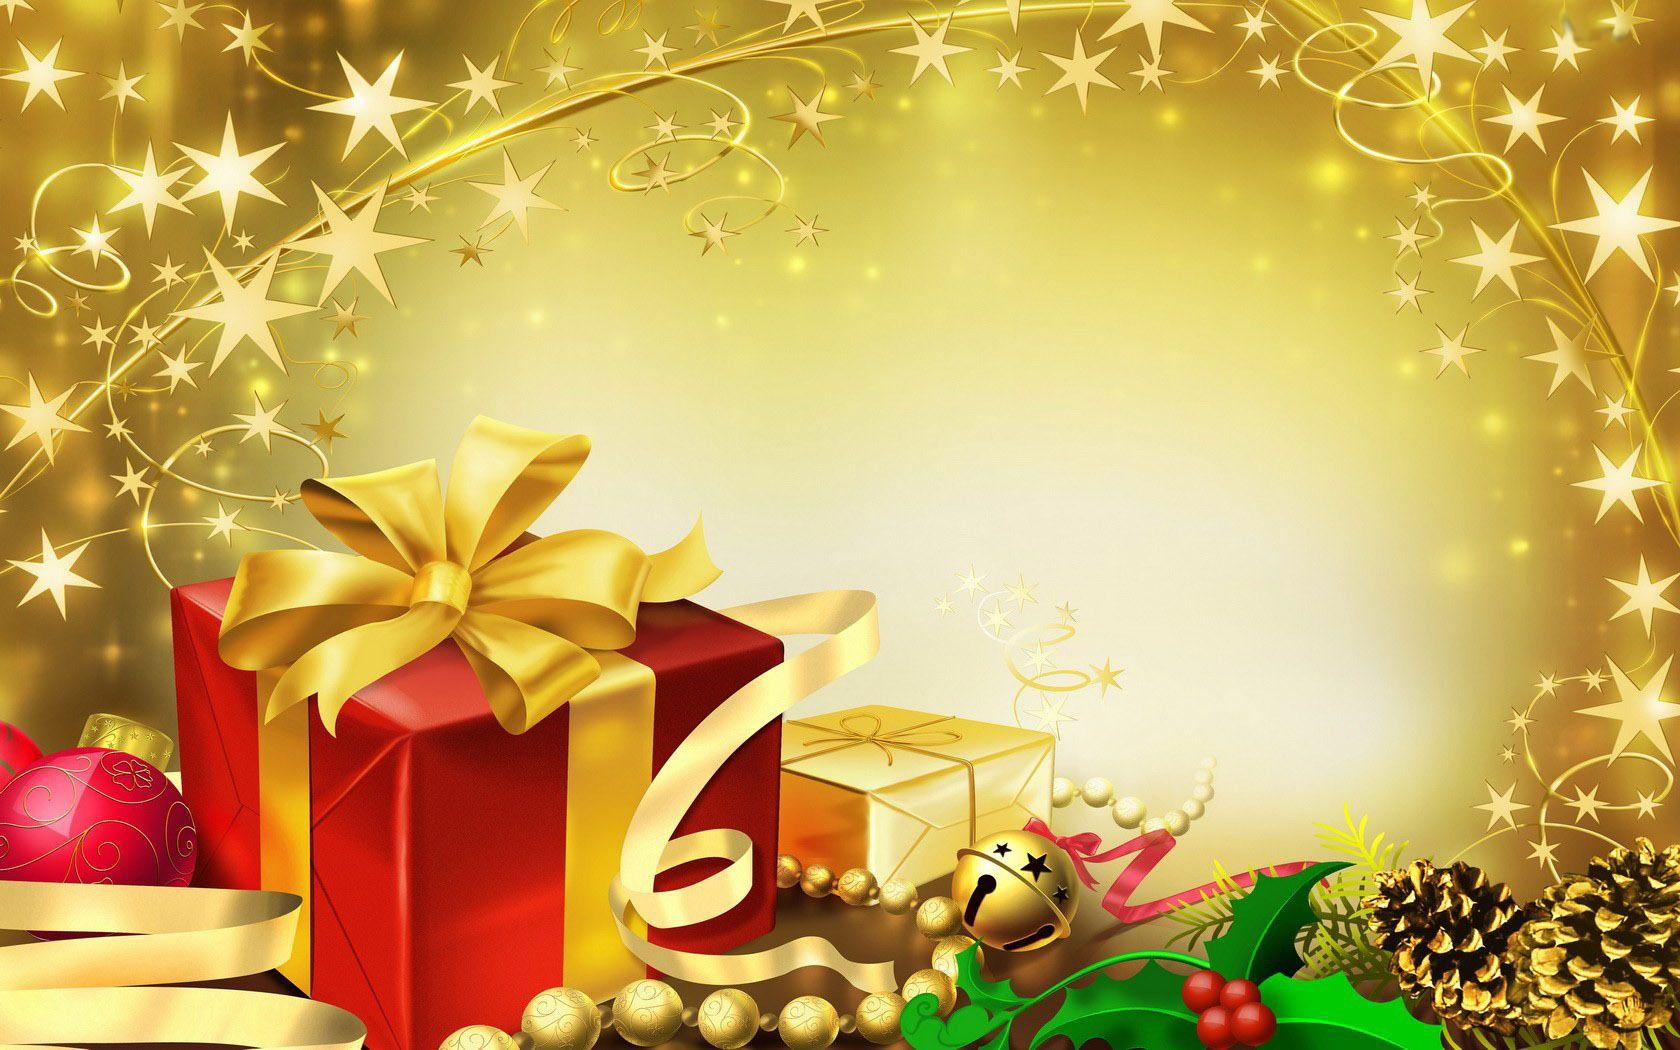 Amazing Wallpaper Music Christmas - 22677fa3b7e4b296a67dbf0fe1f0339d  Collection_446960.jpg